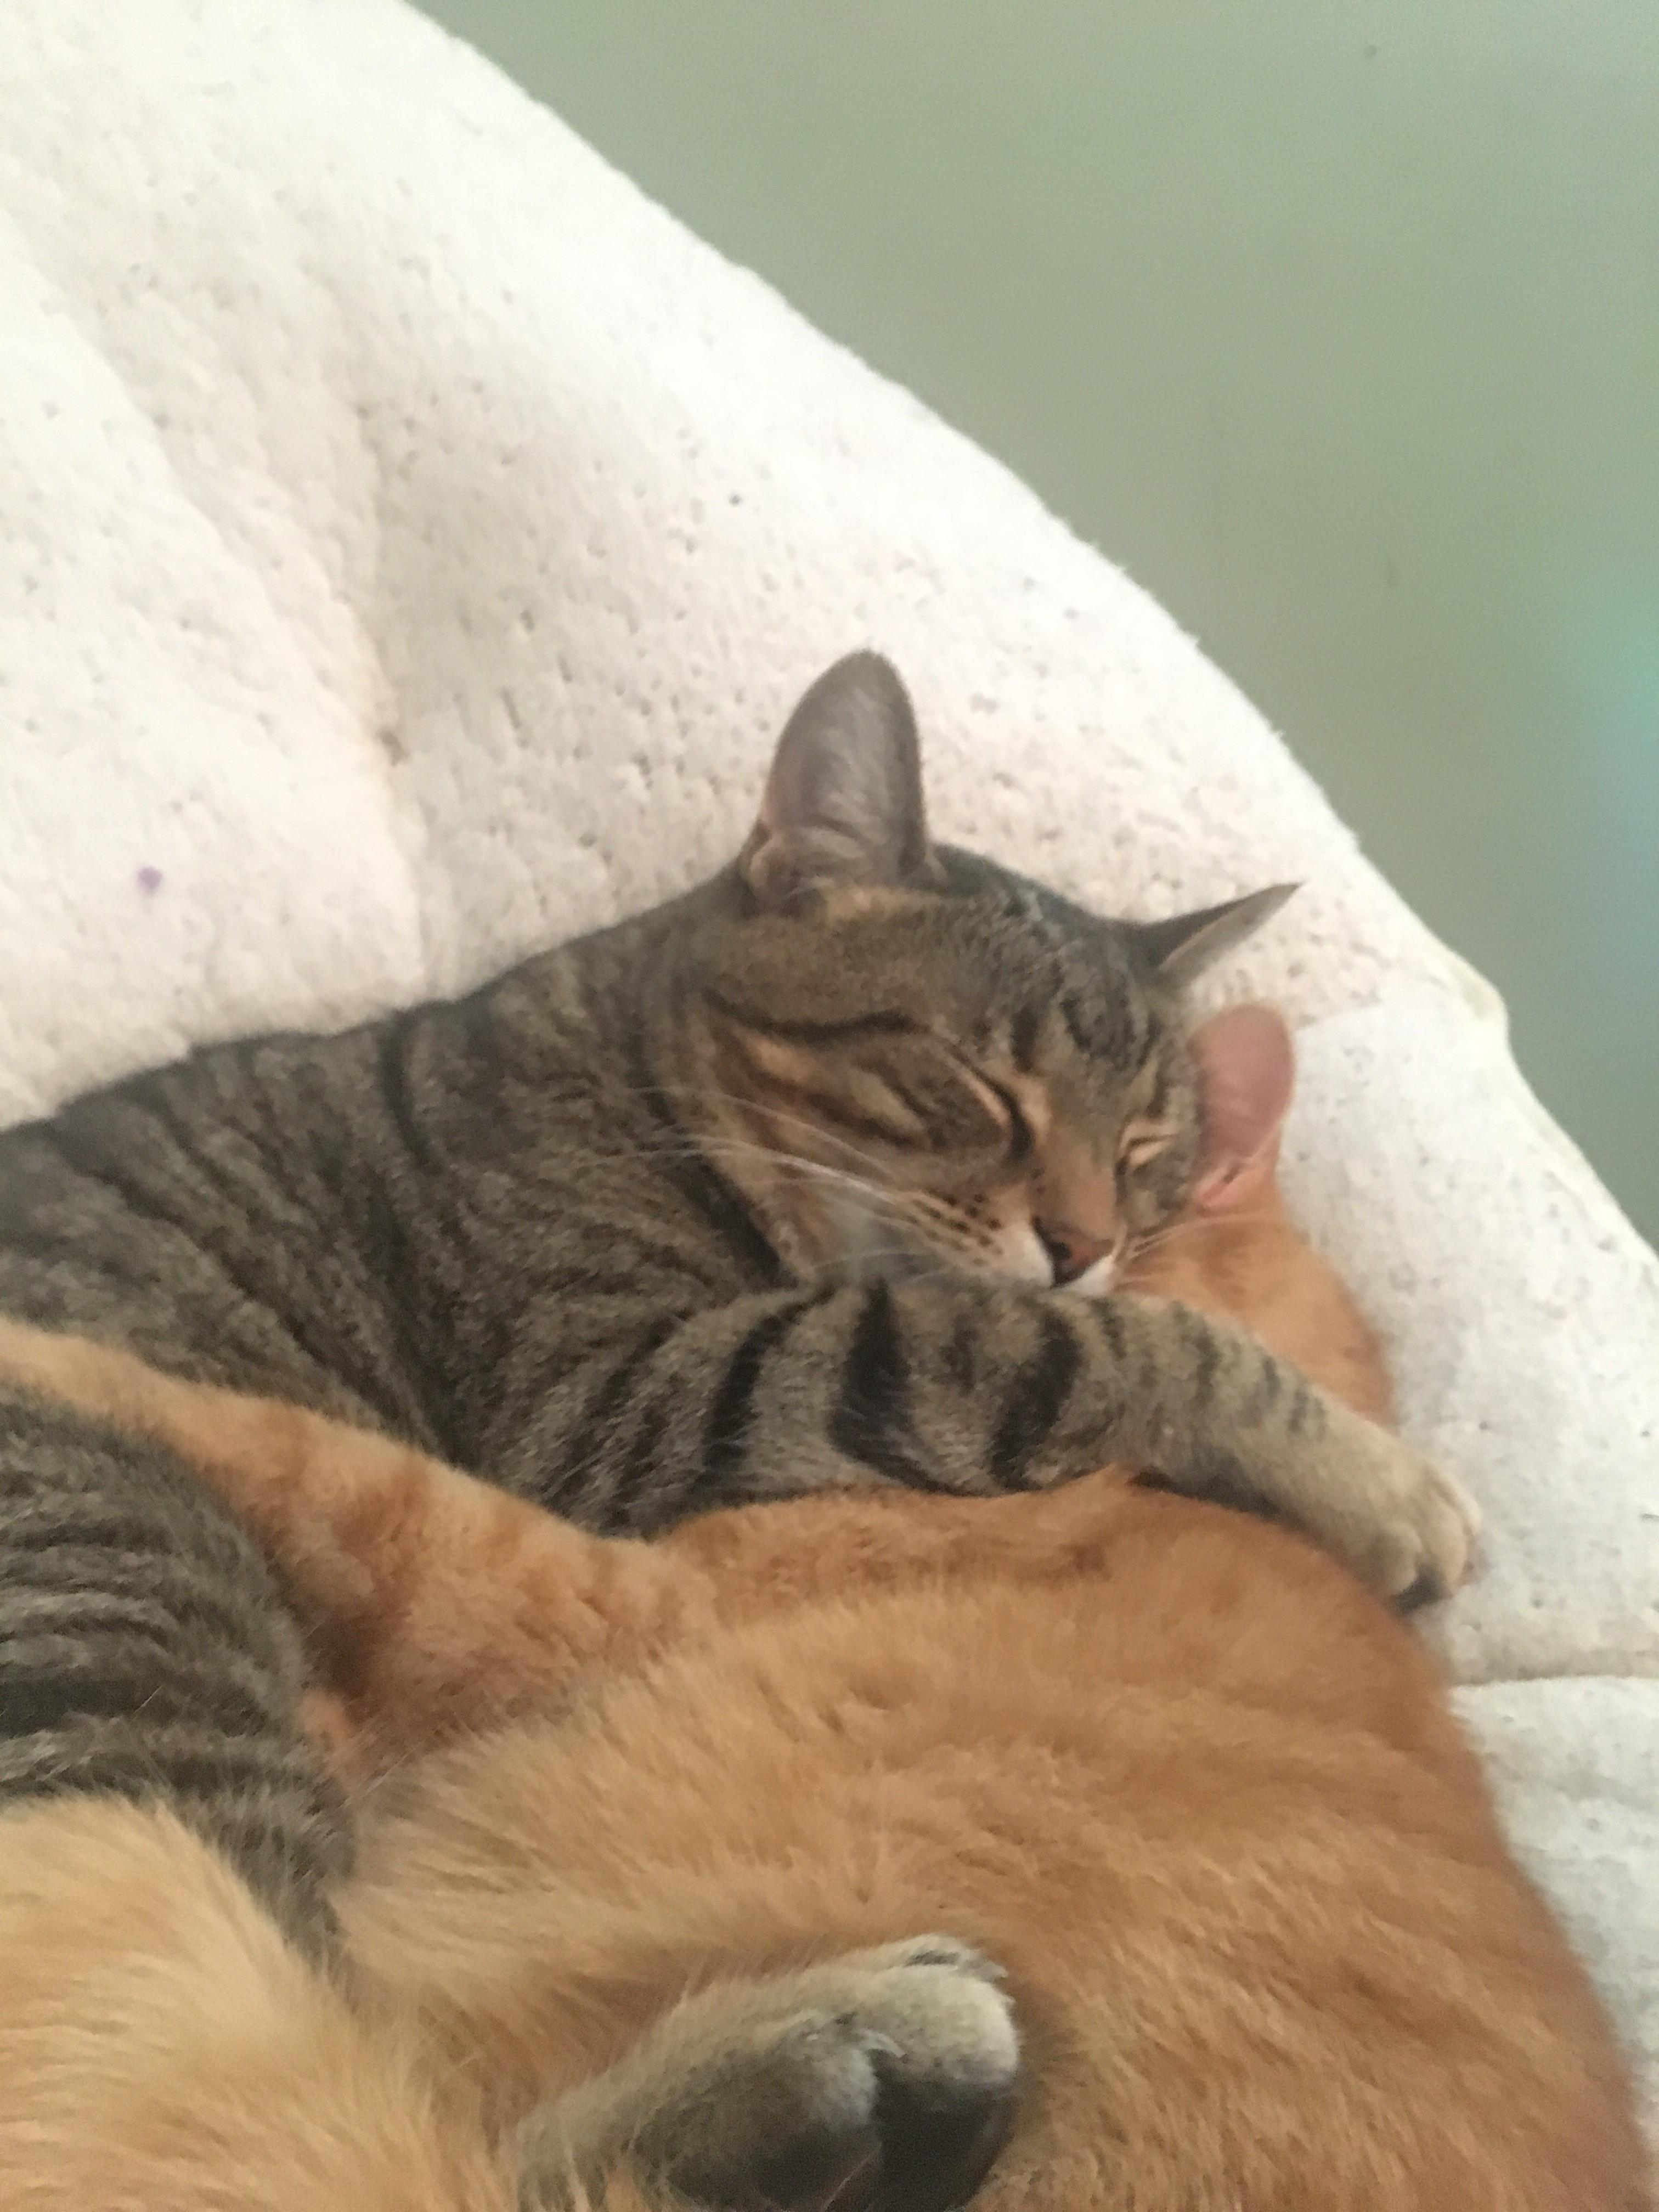 My Cats Sleeping Together Https Ift Tt 2geyveq Cat Sleeping